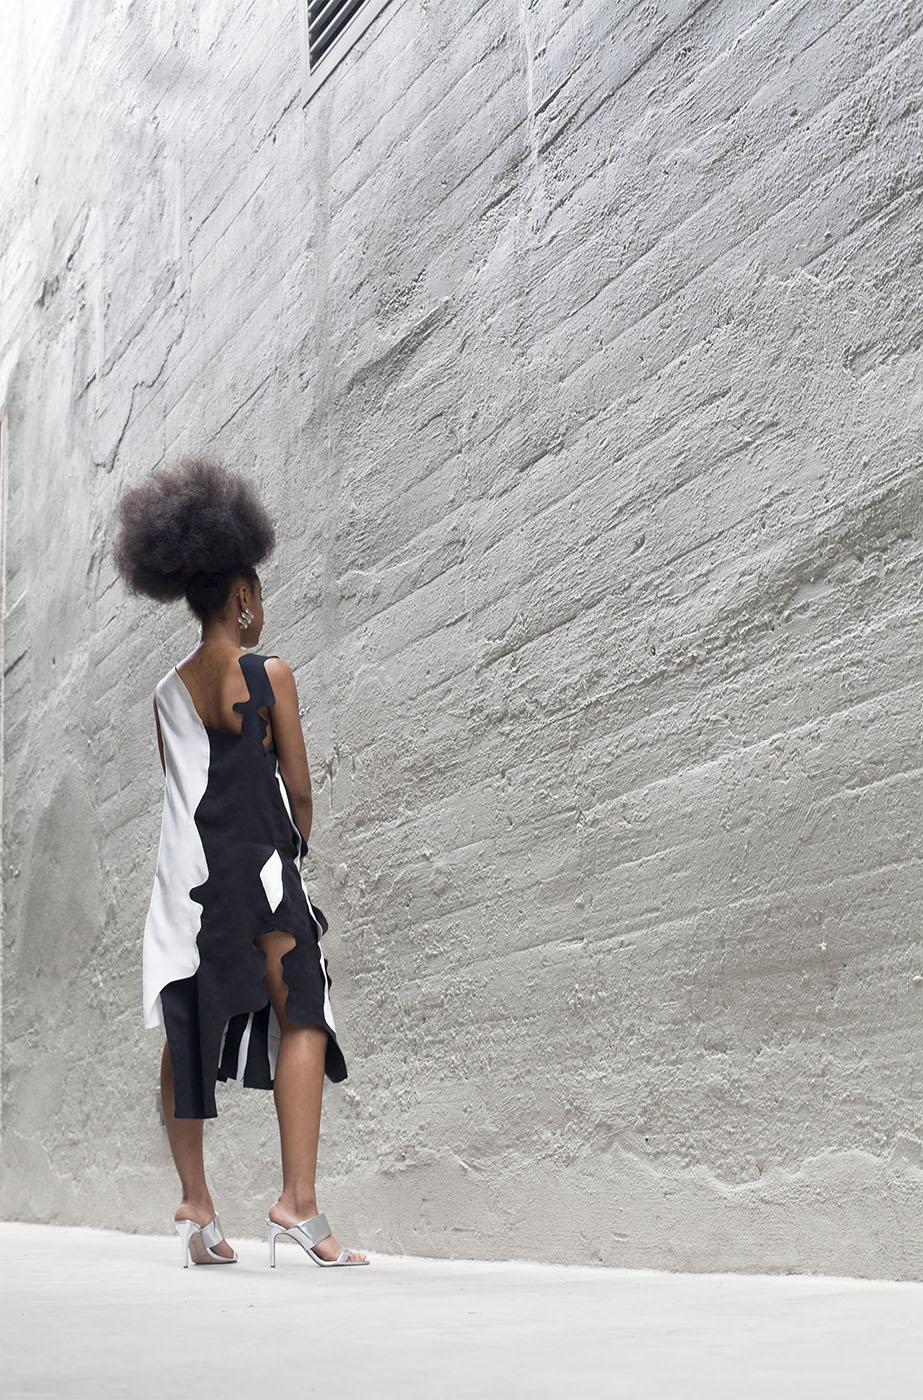 Laser Cut Ultra Suede Silhouette Dress